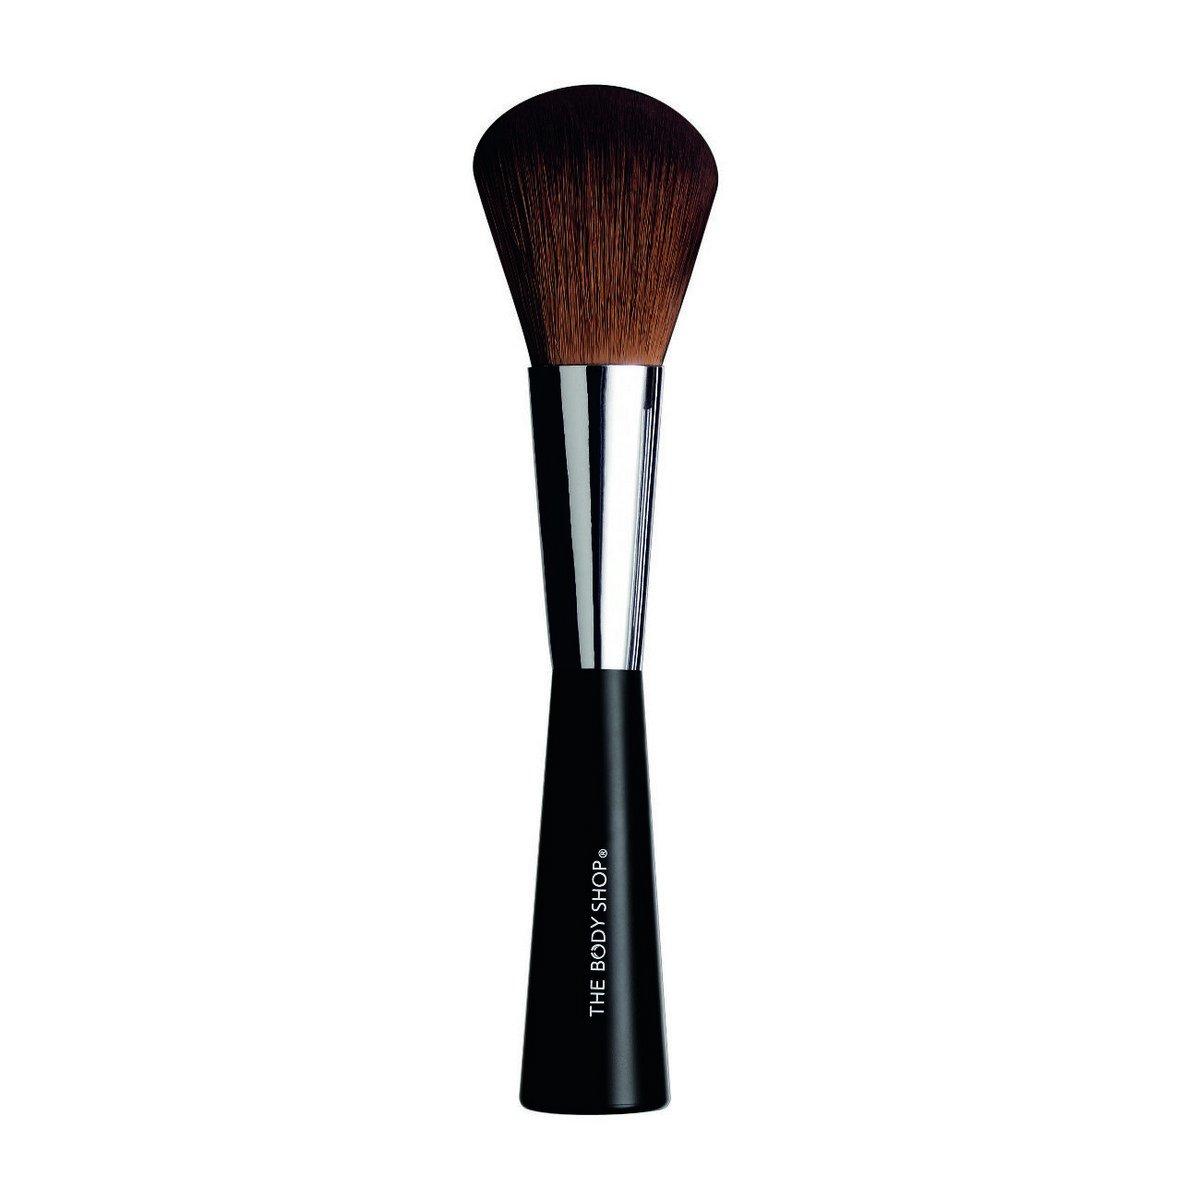 The Body Shop Face & Body Brush, 0.001 Ounce